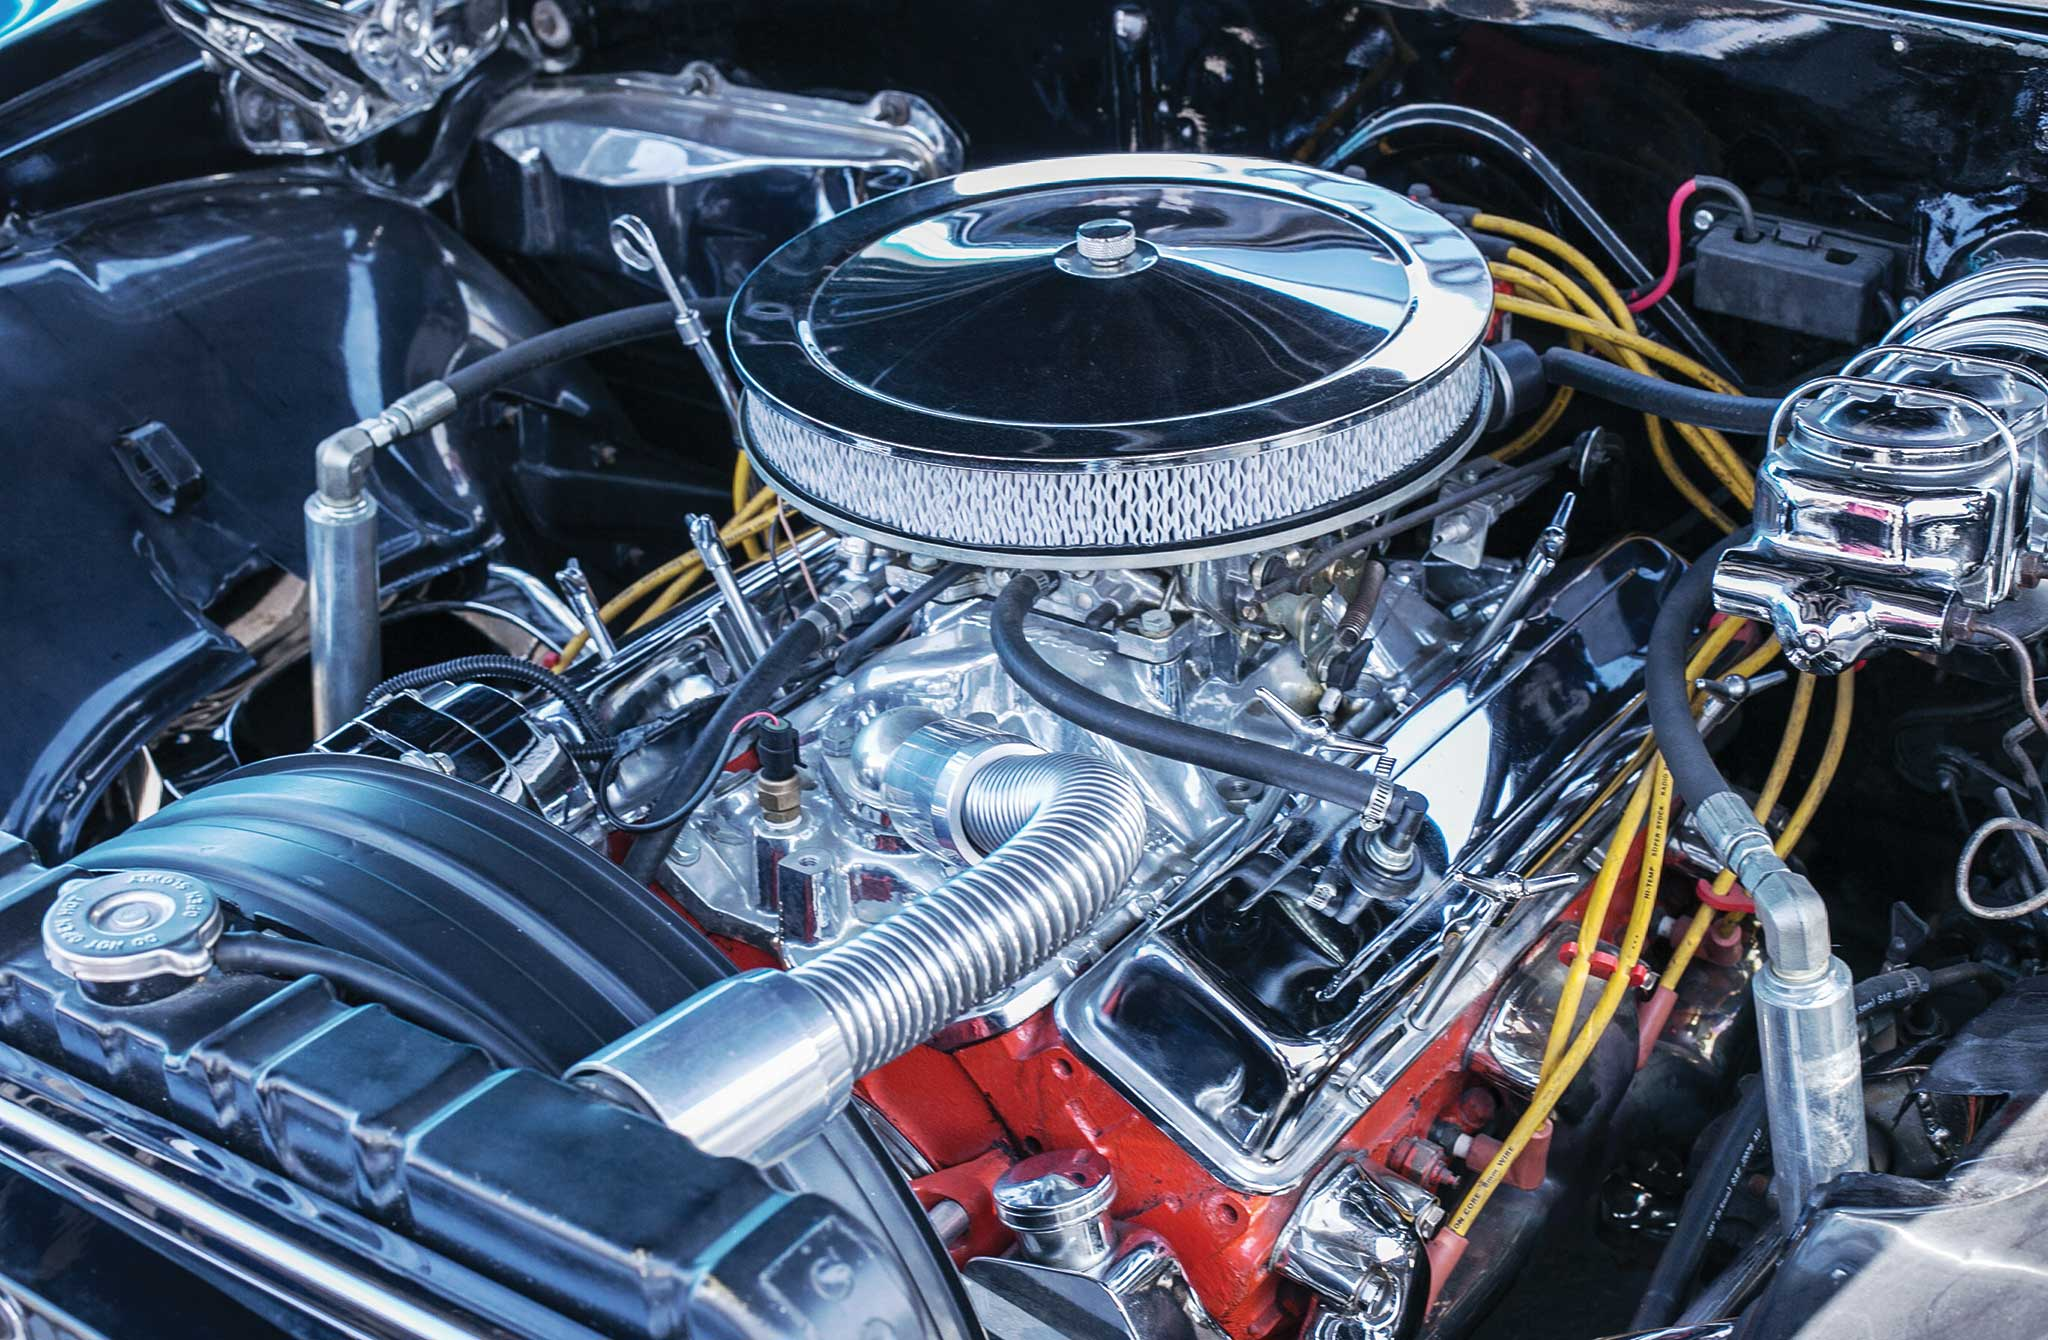 1967 chevrolet impala 350 chevy small block 001